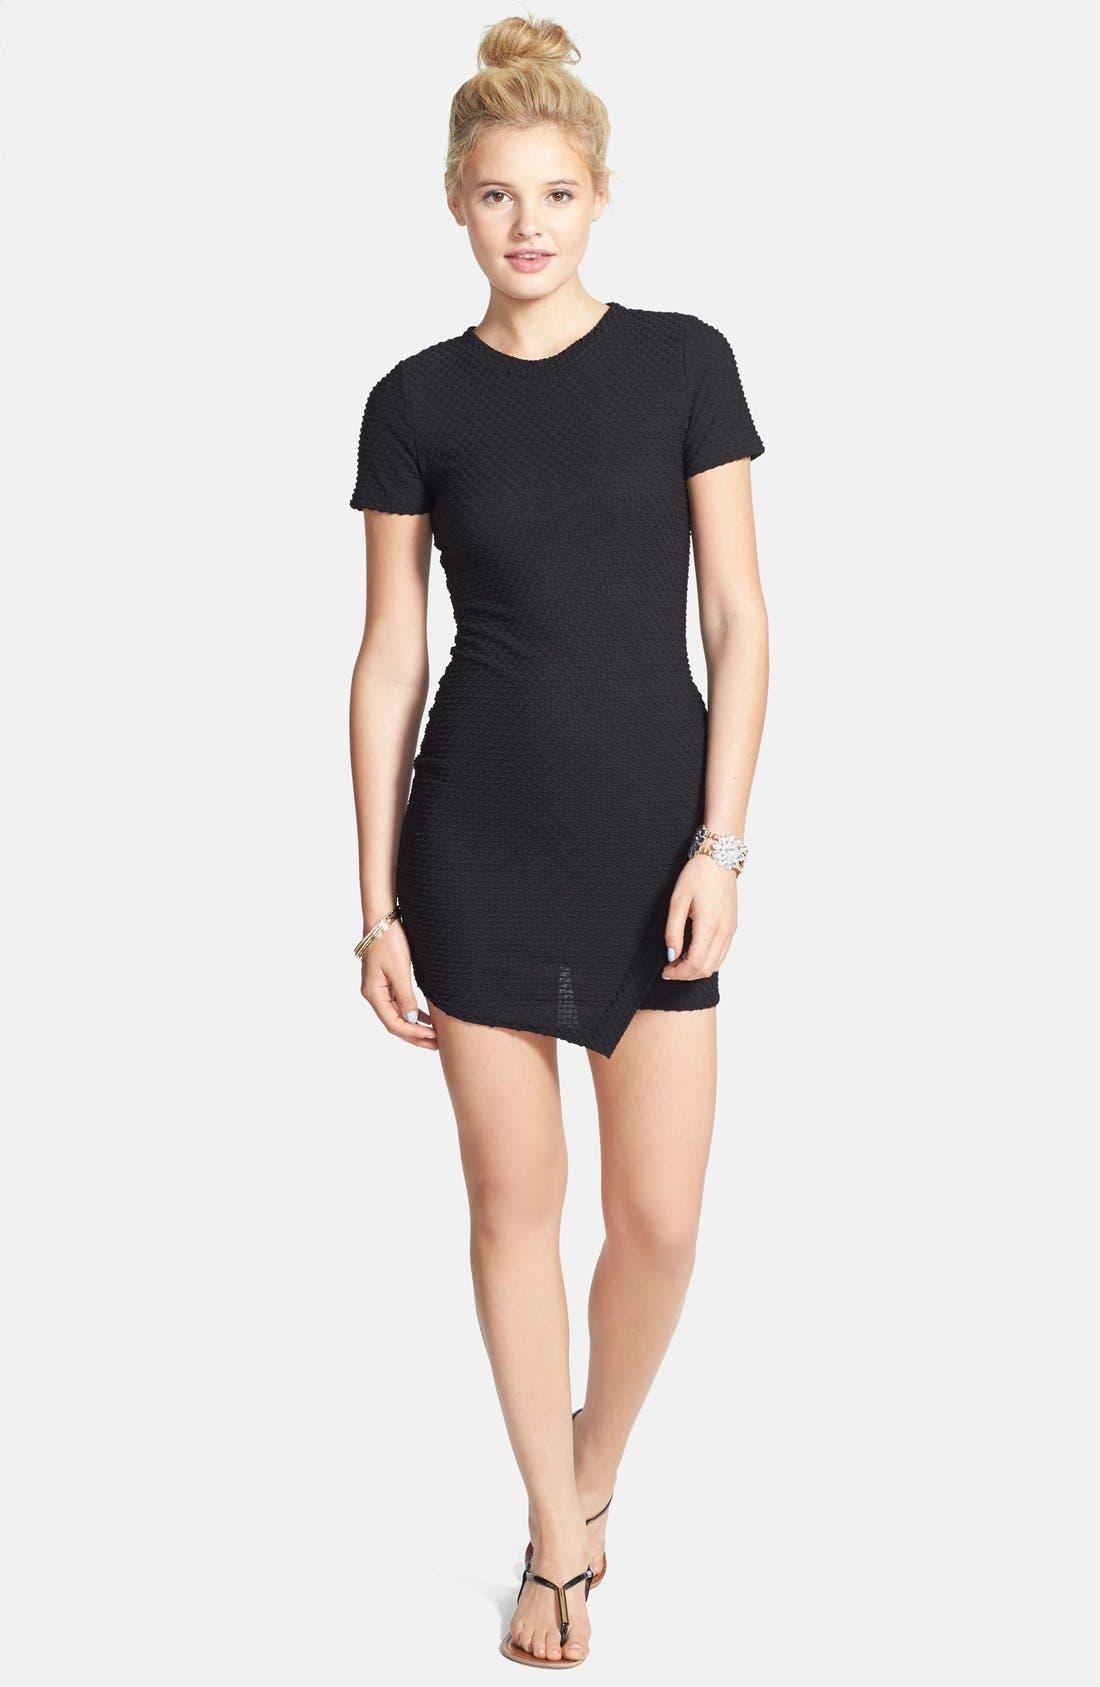 Alternate Image 1 Selected - dee elle Textured Body-Con Dress (Juniors)